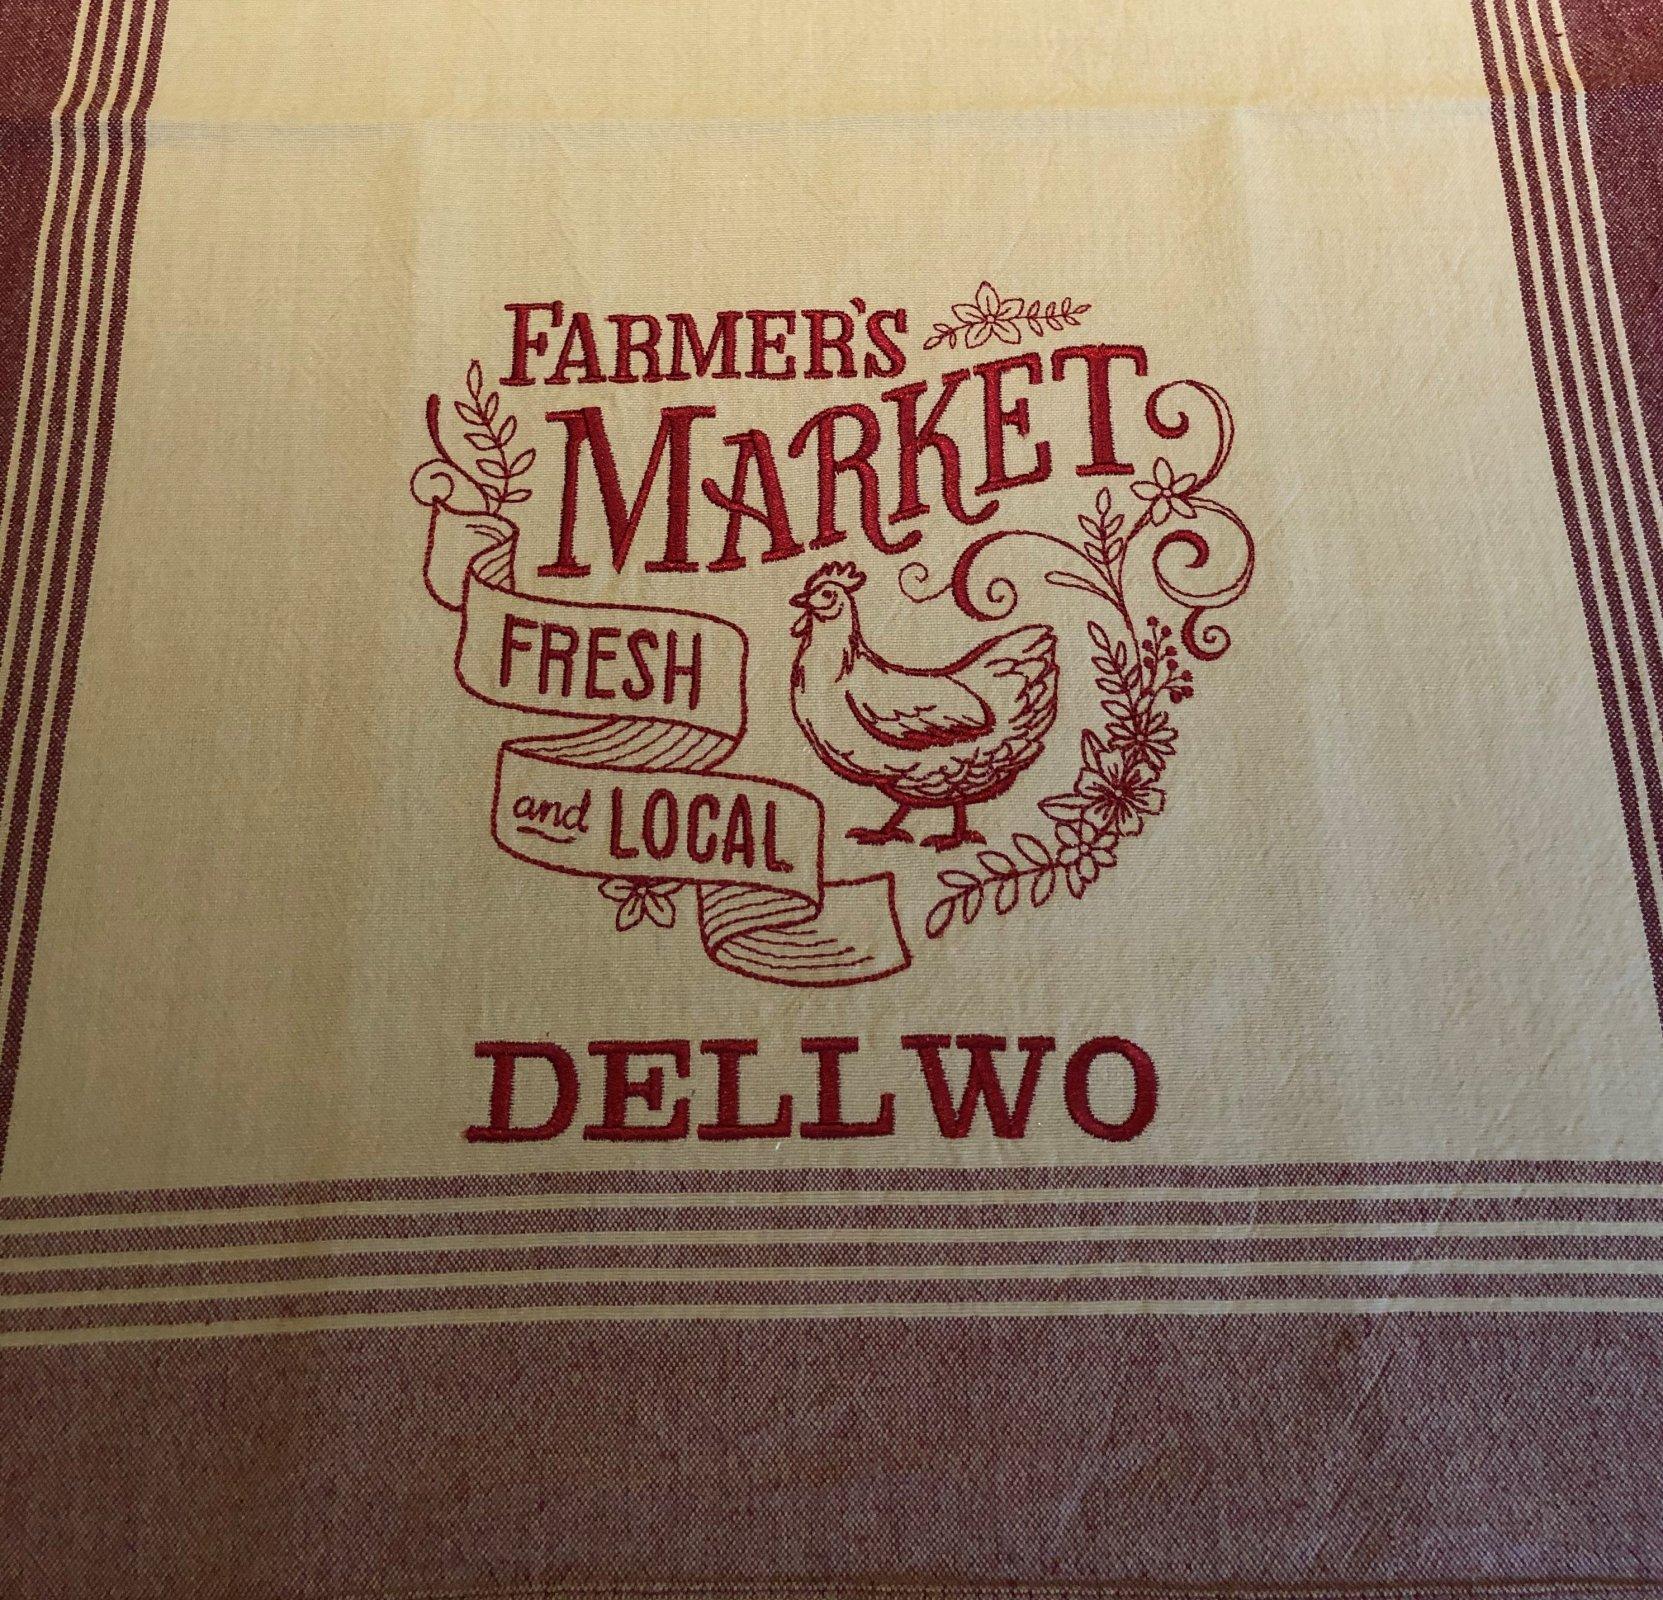 Farmers Market Towel - Personalized